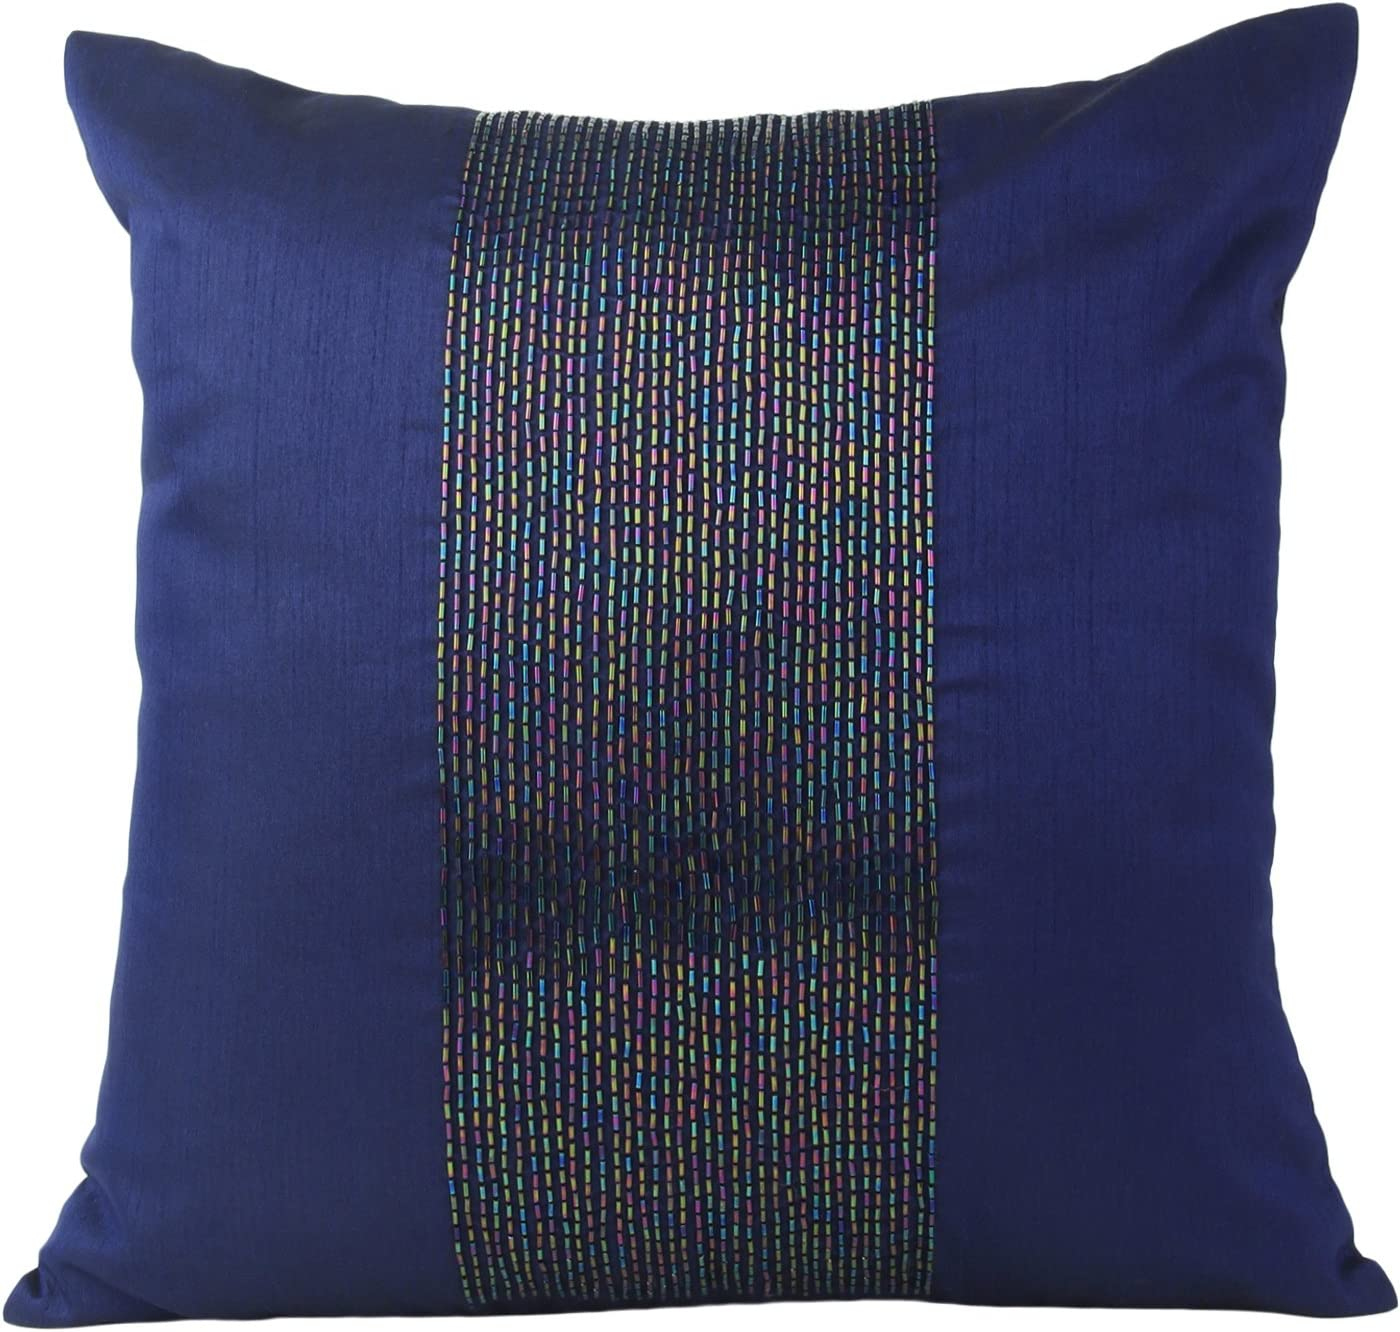 Amazon Com The White Petals Navy Blue Decorative Pillow Cover